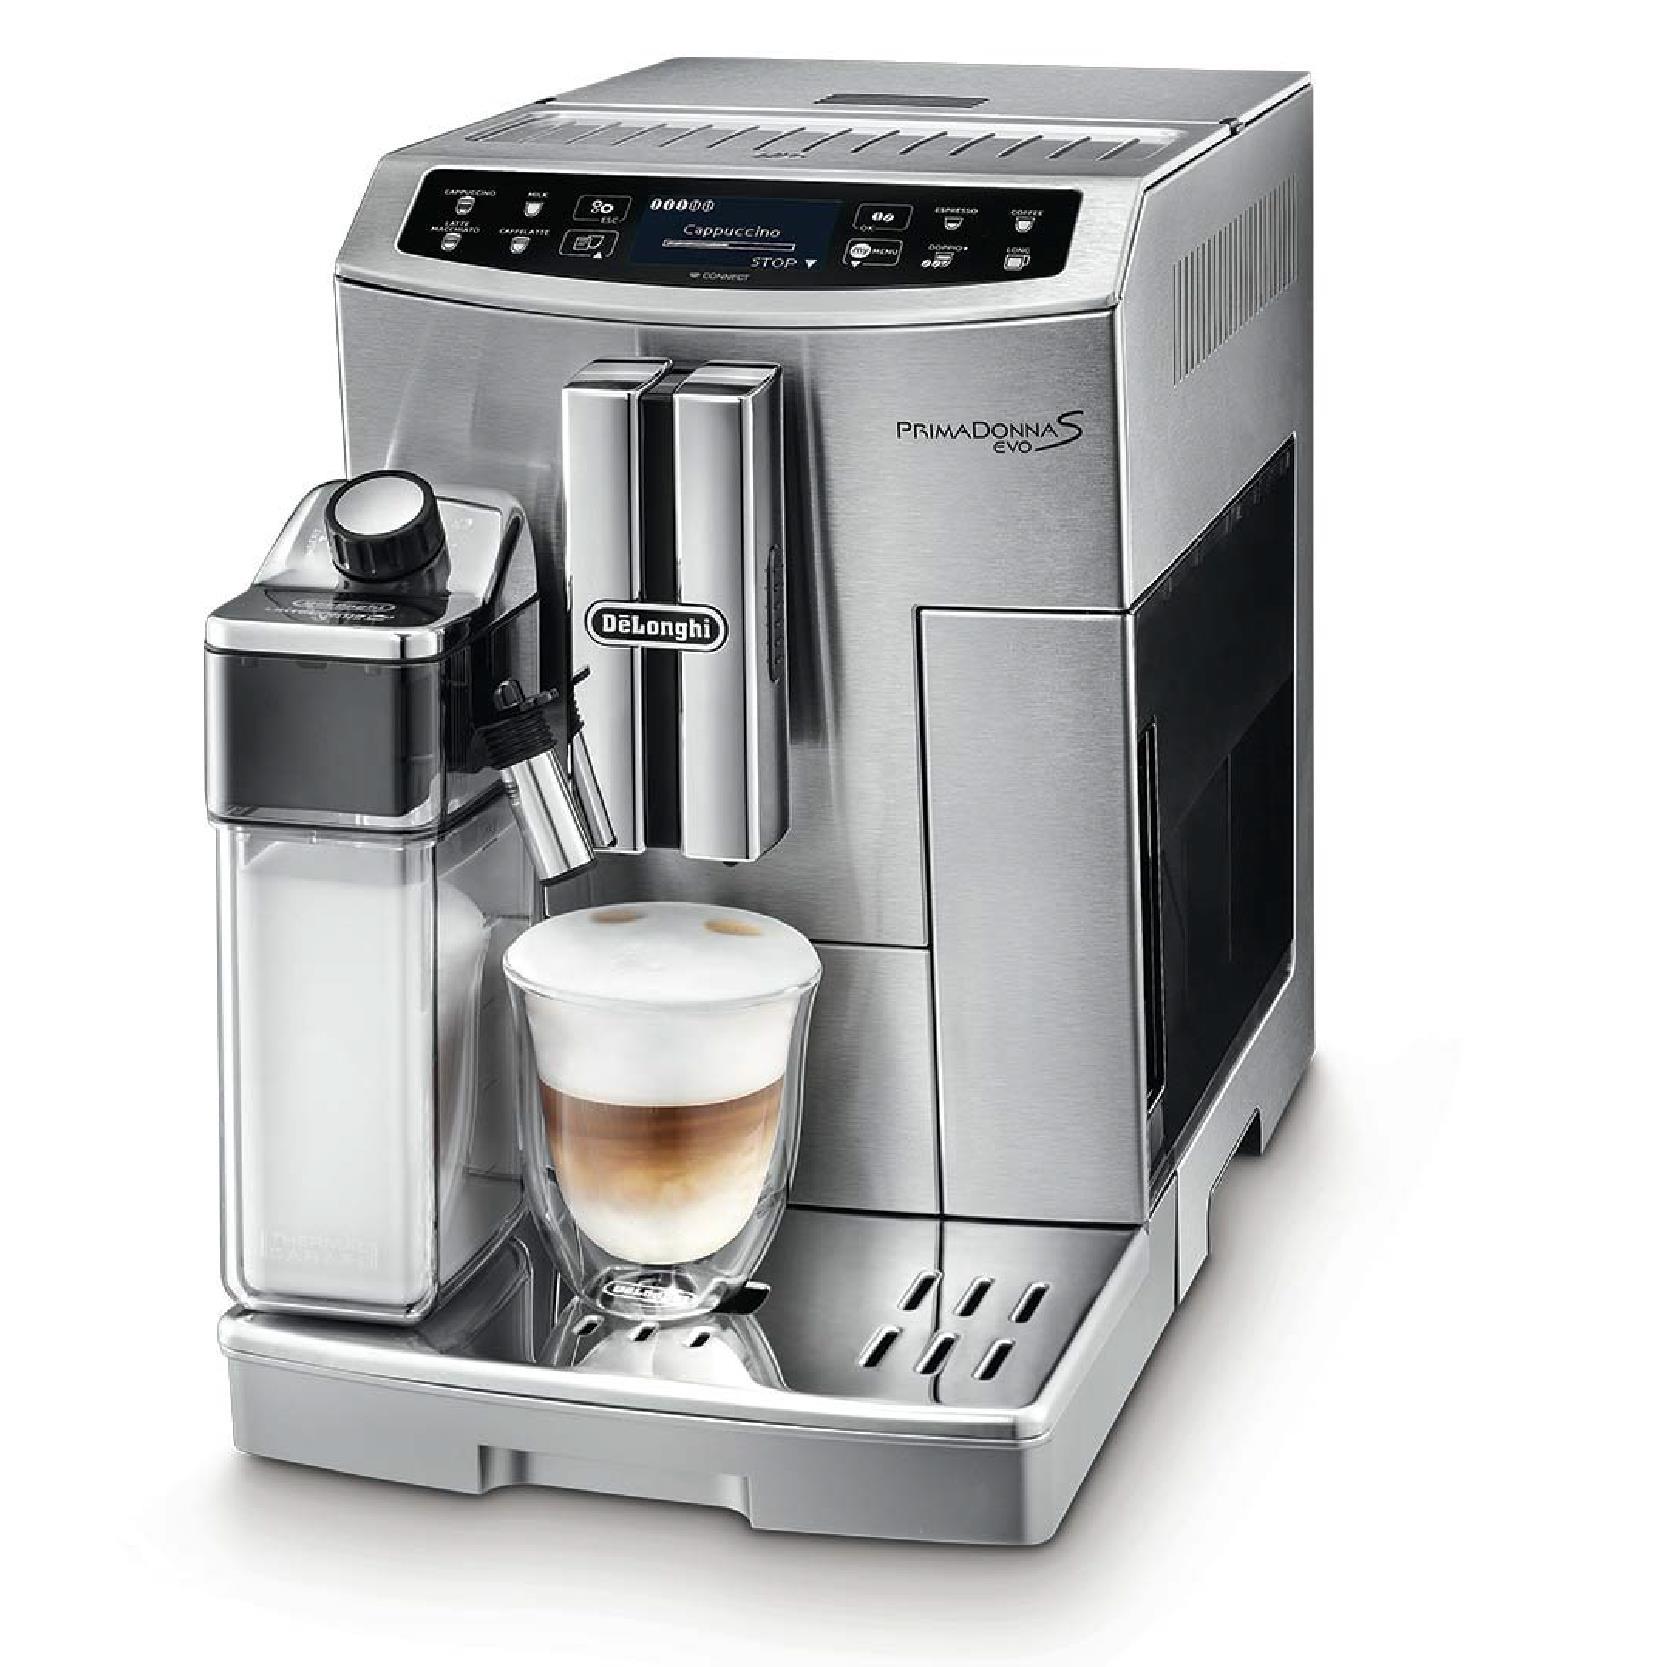 DELONGHI ECAM510.55.M Fully-automatic, 1450W, Inox/Black color